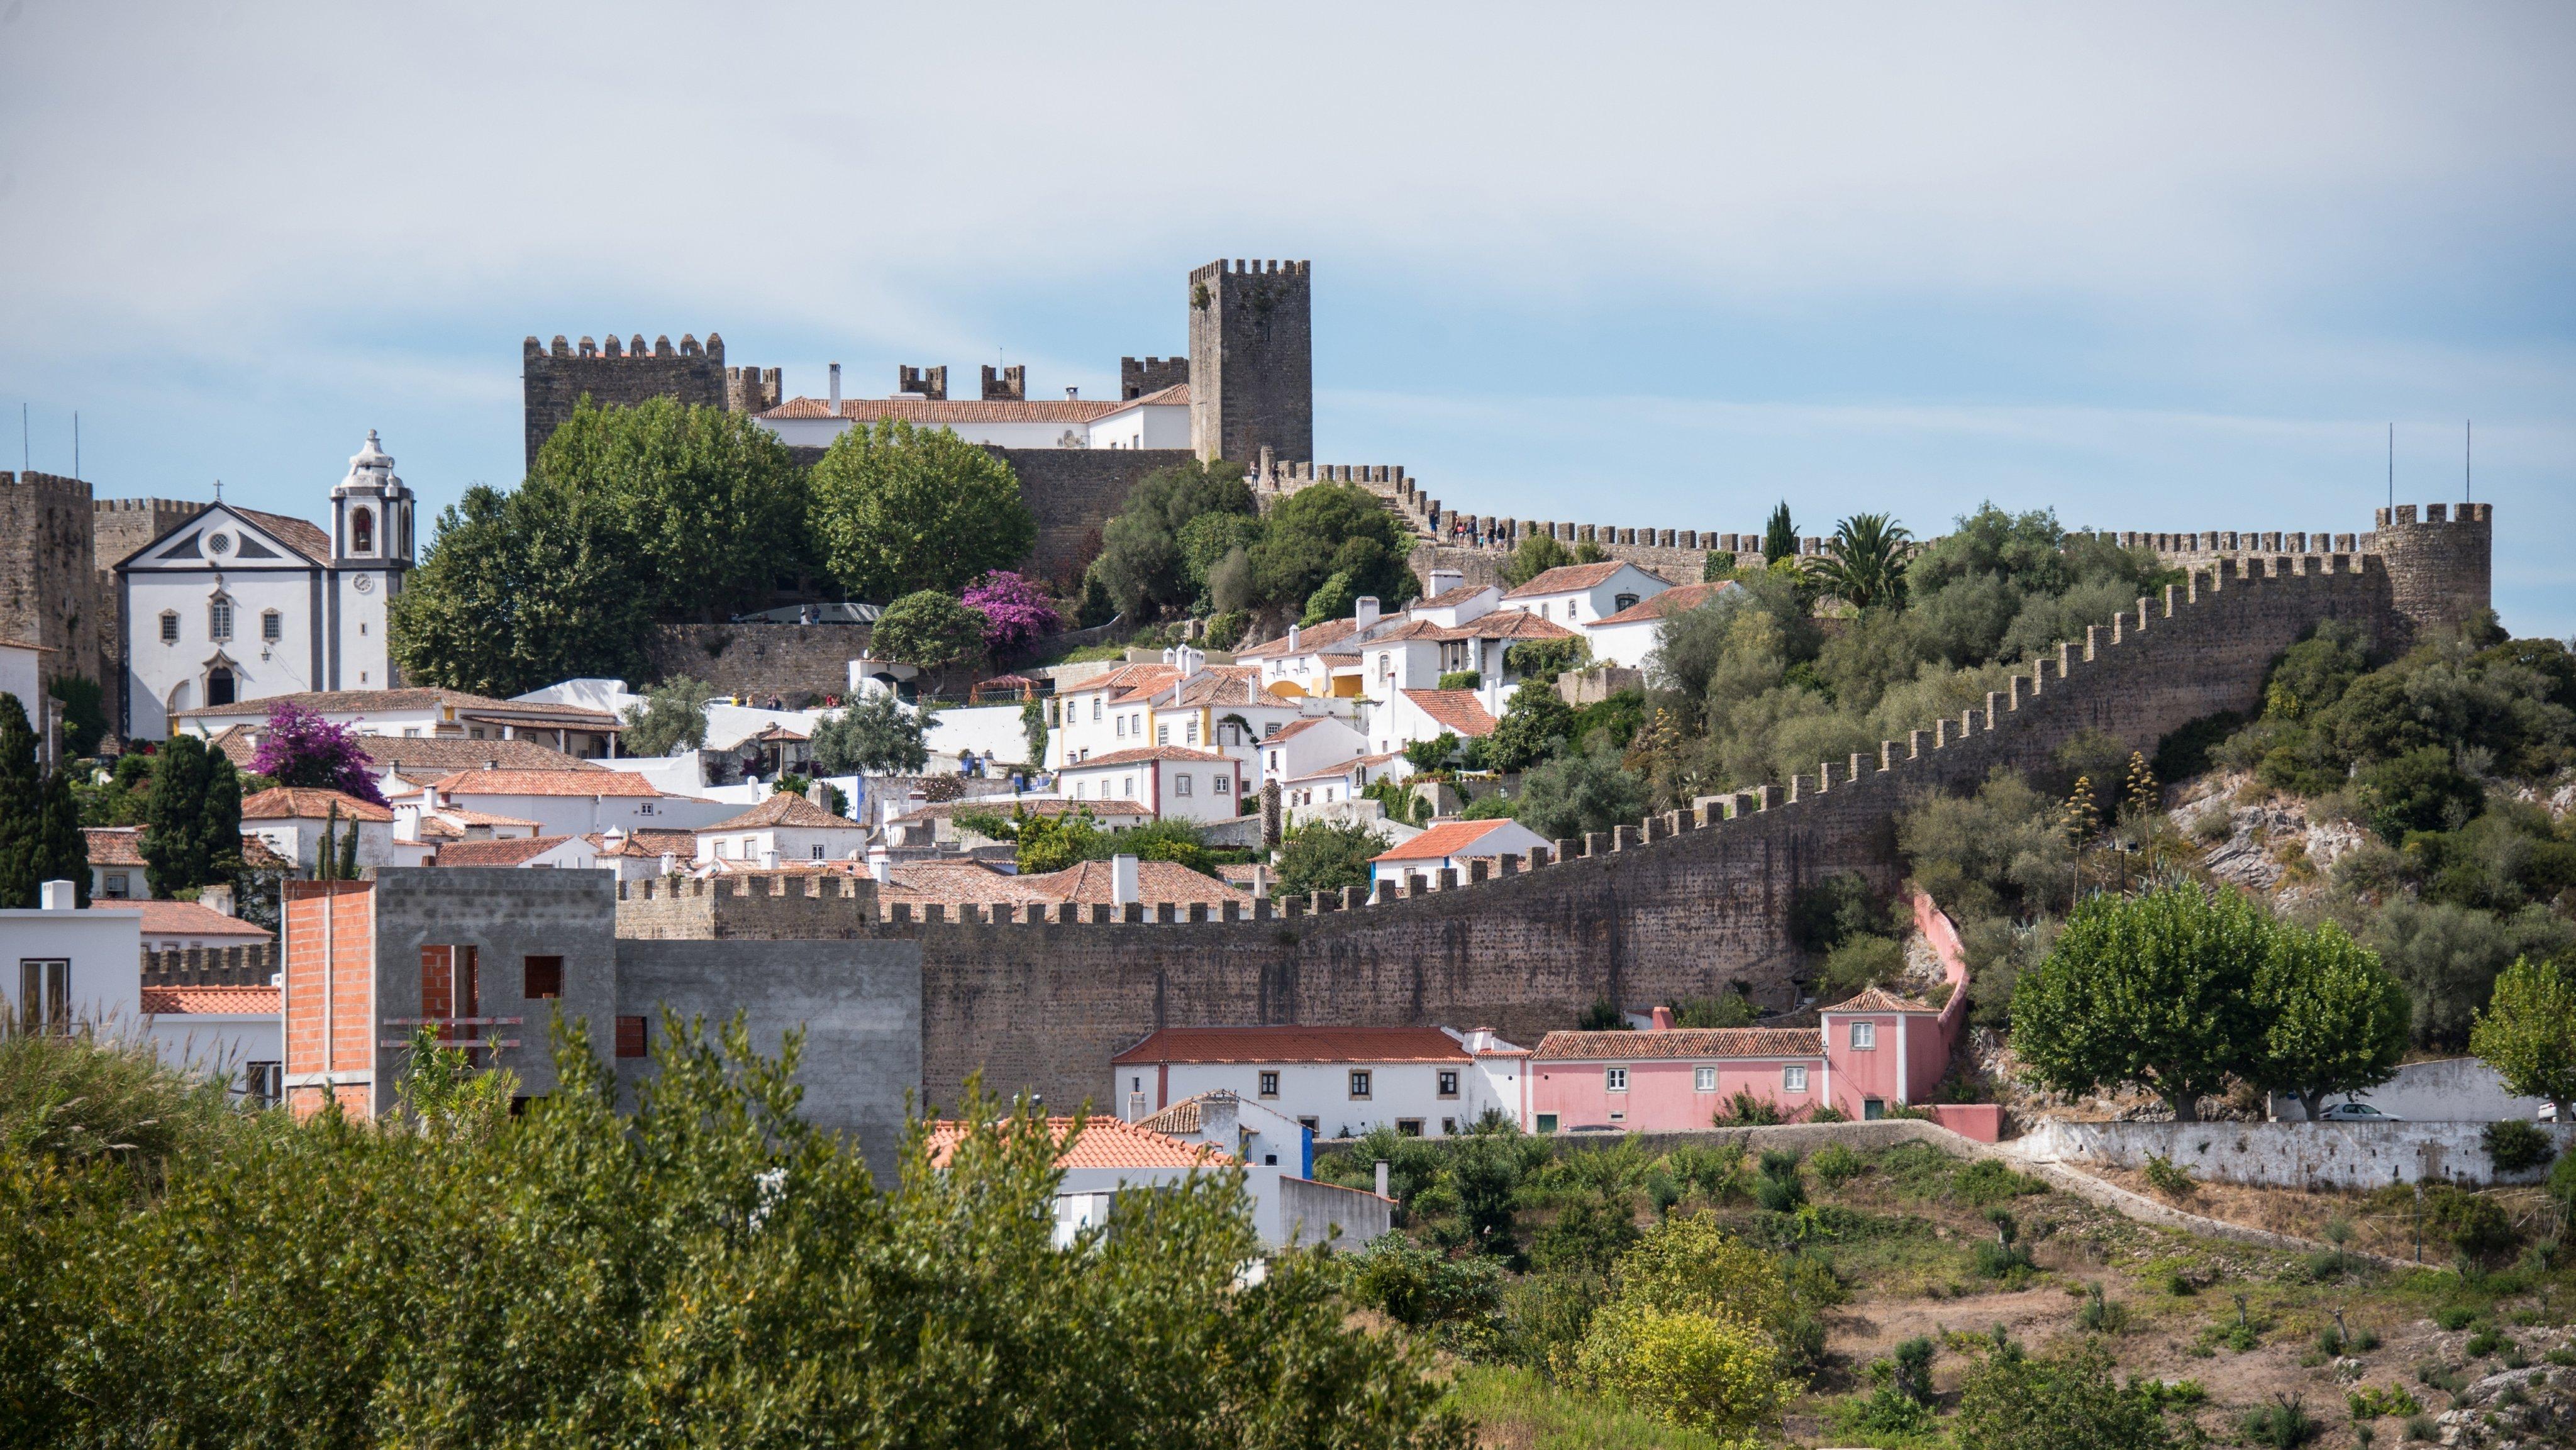 Europe. Portugal. Estremadura Region. Leiria District. Obidos. Cityscape